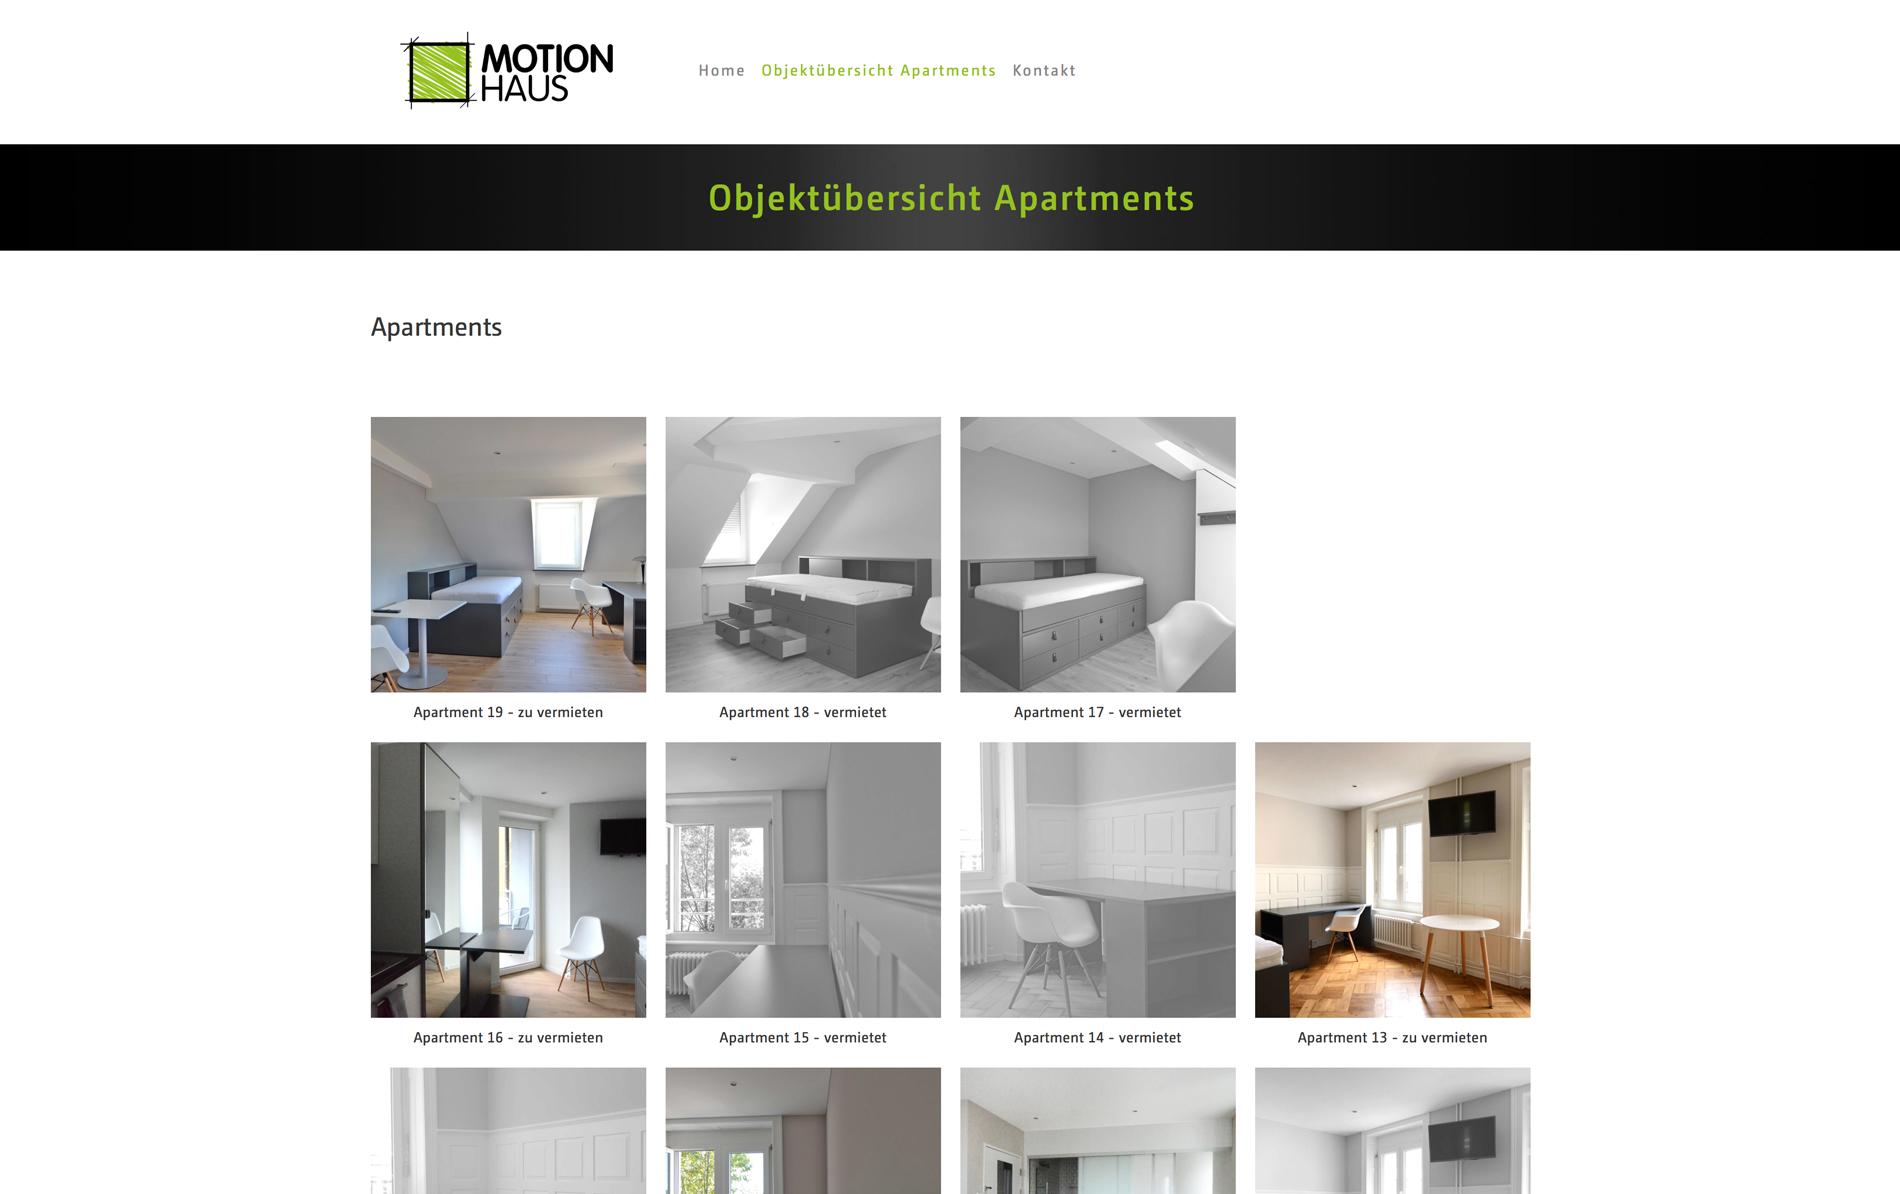 motionhaus_1.jpg